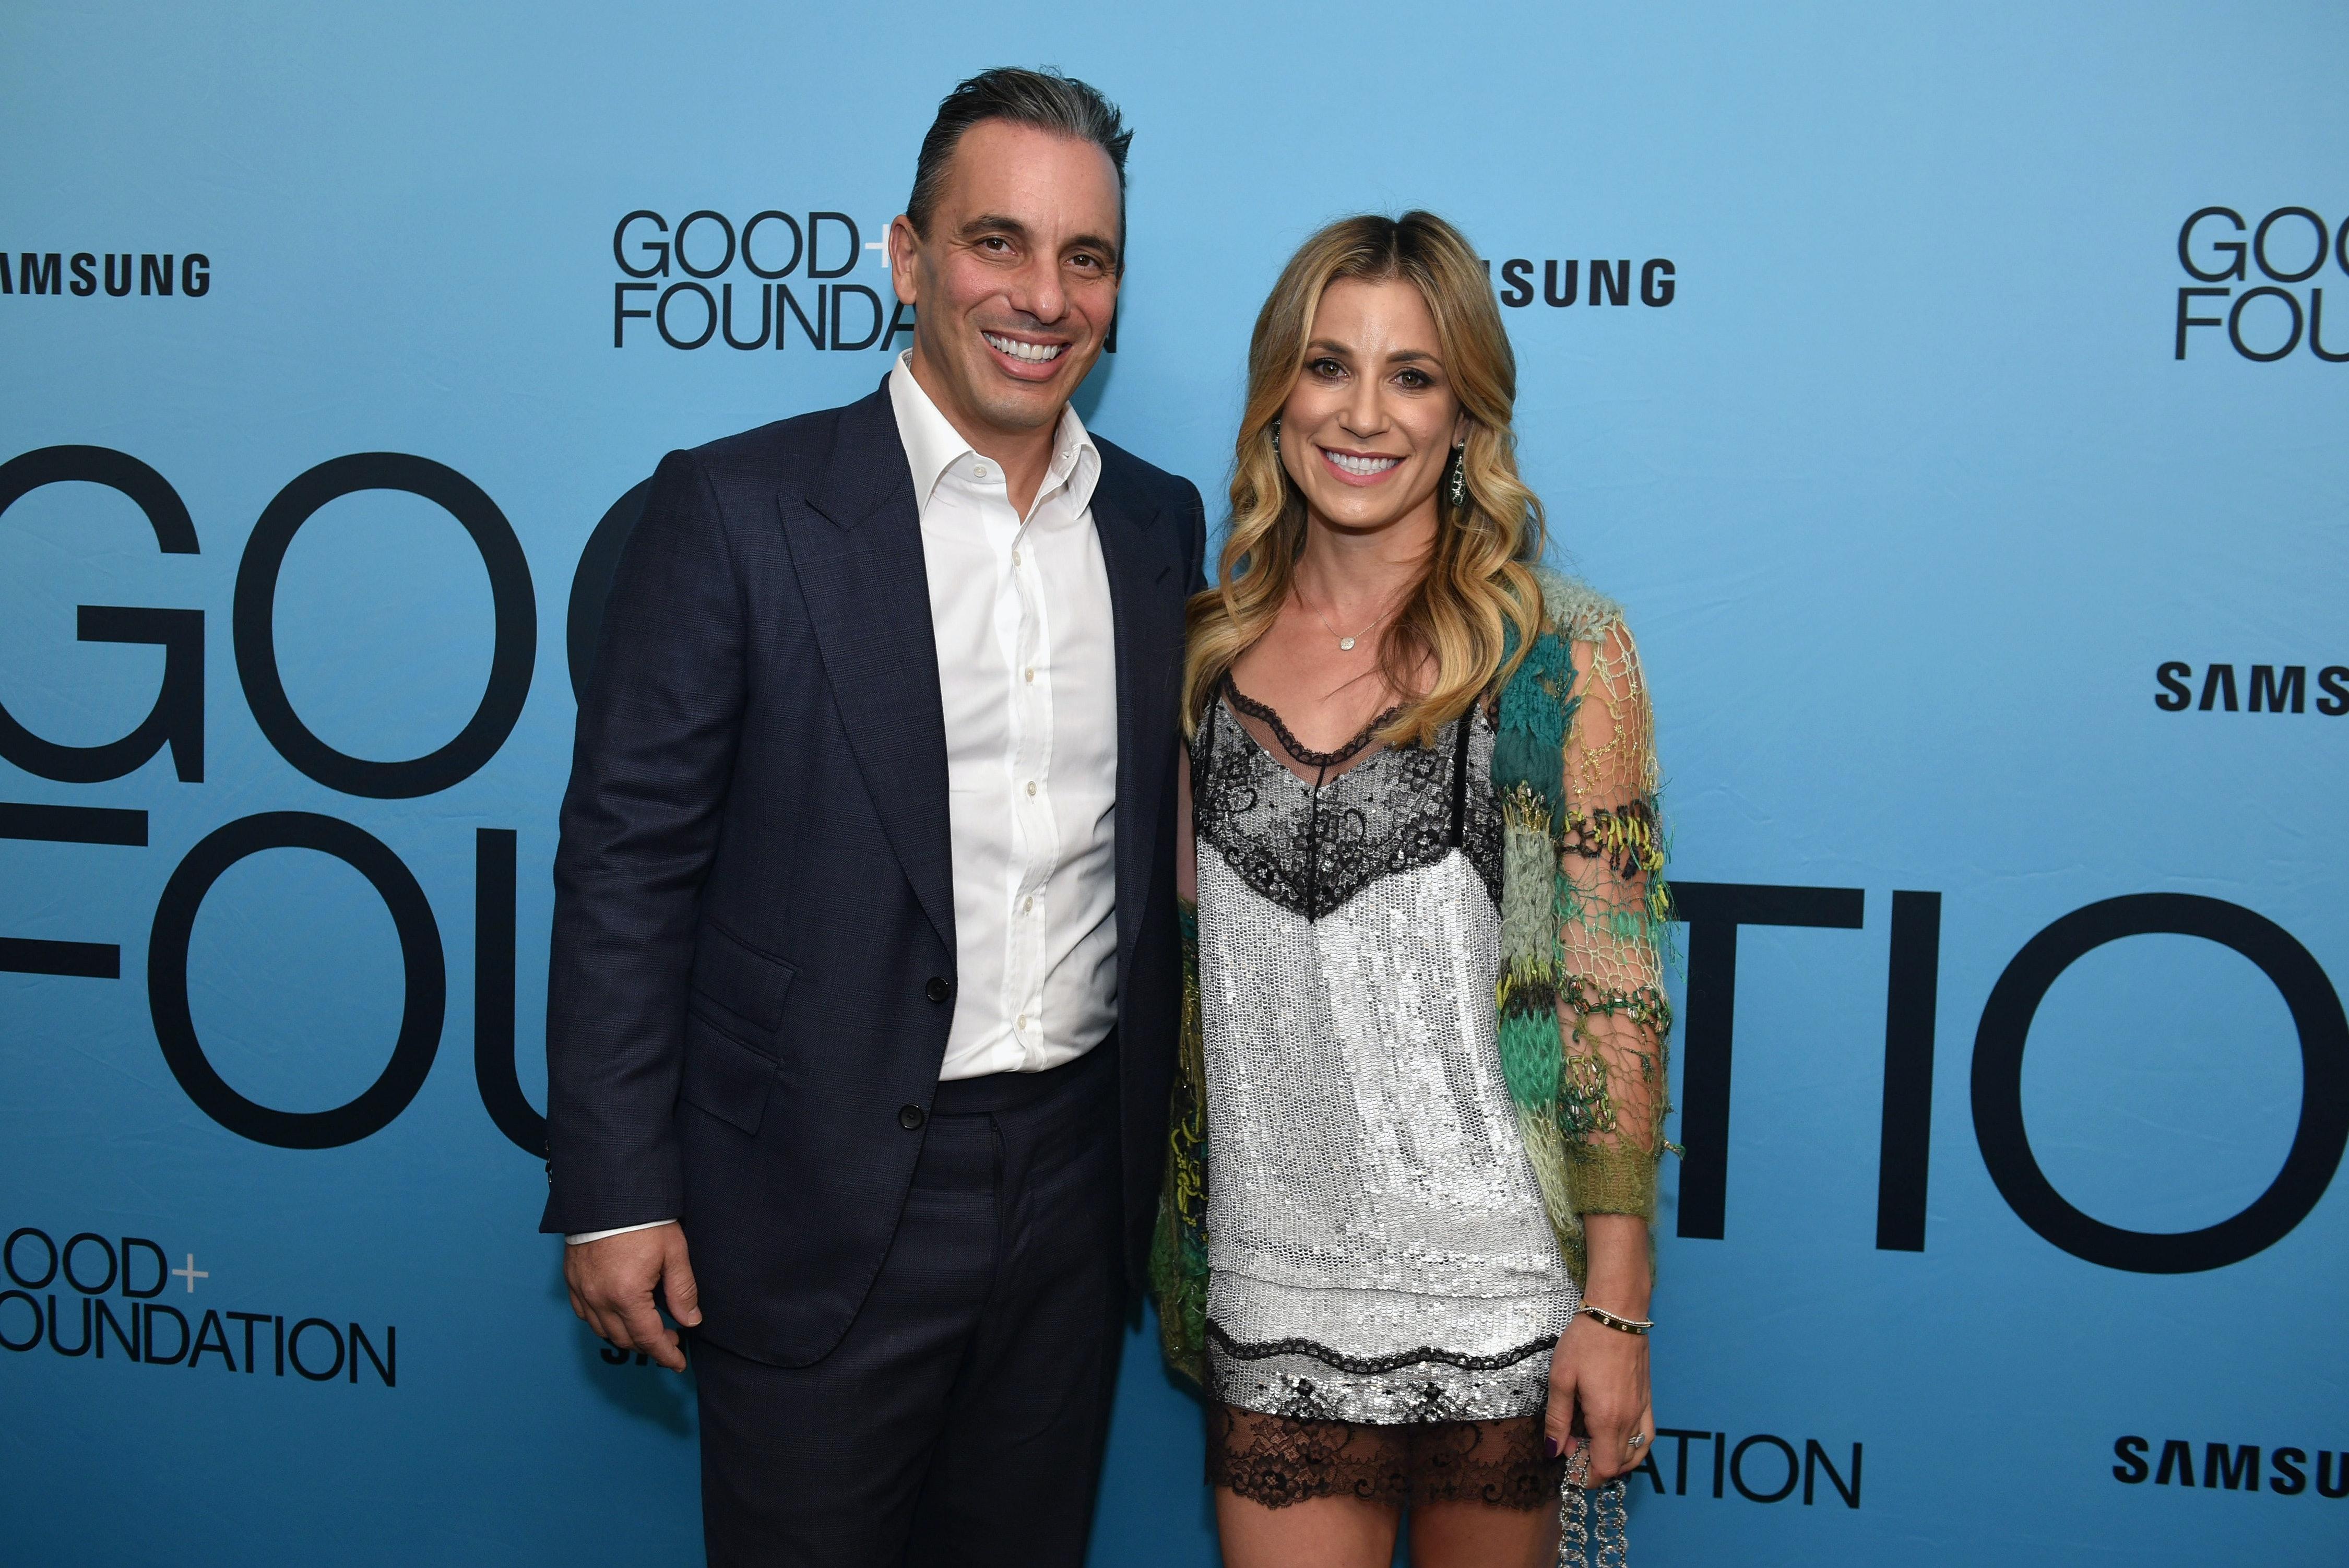 Sebastian Maniscalco with sweet, Wife Lana Gomez